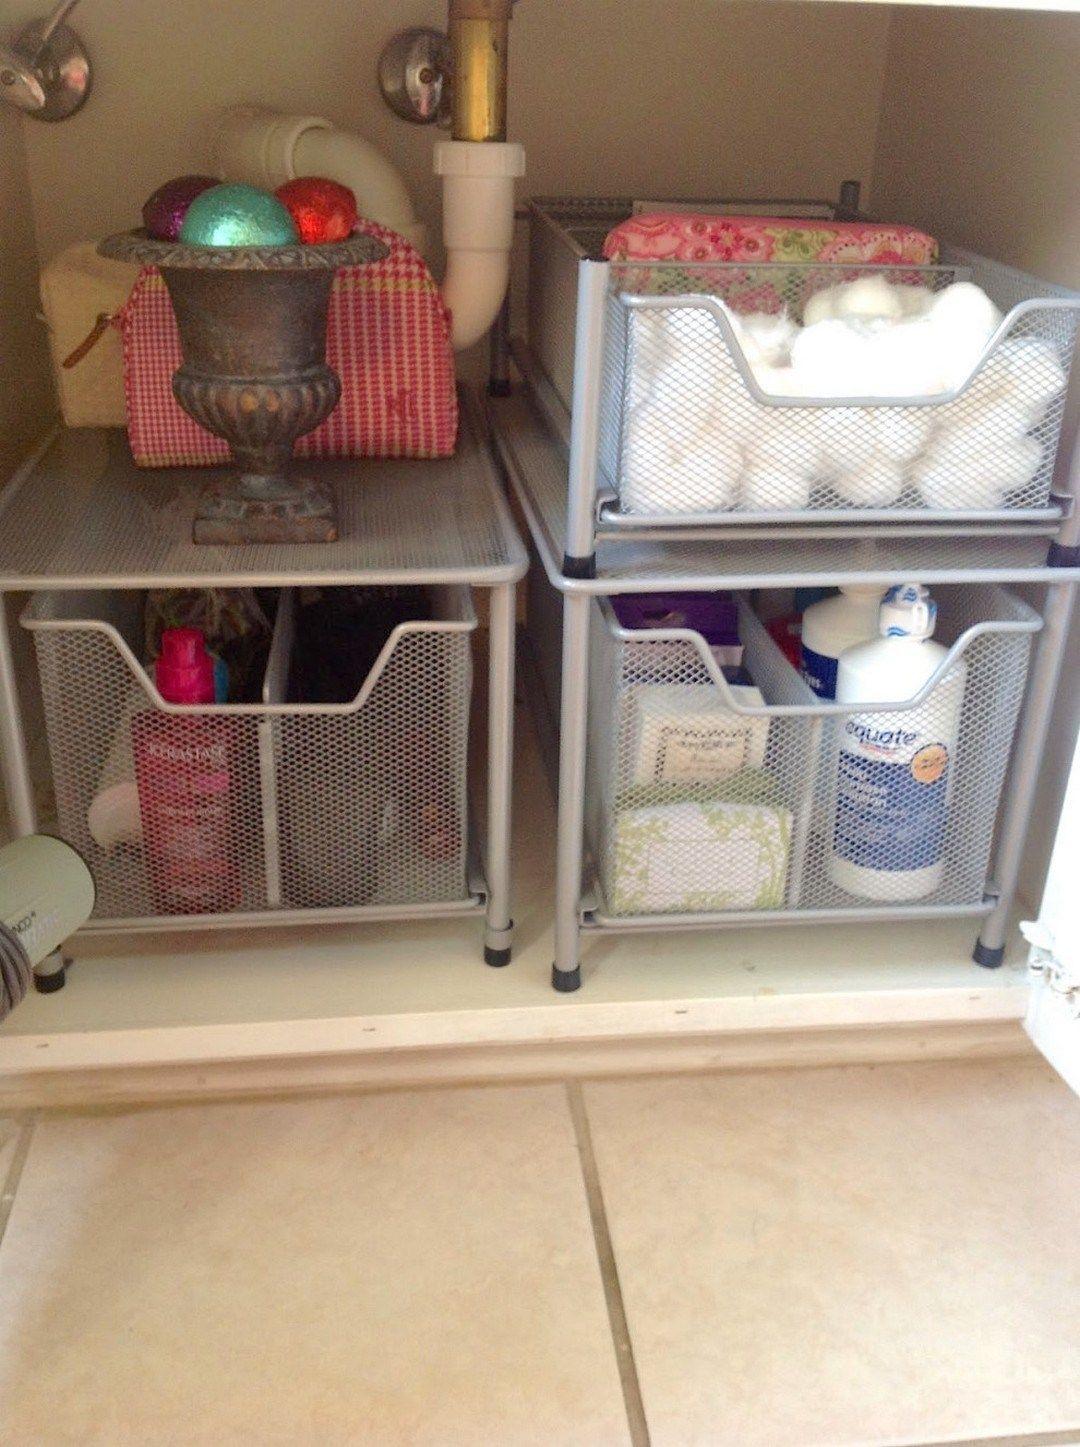 Genius Apartment Storage Ideas For Small Spaces 1 Dorm Room Storage Bathroom Sink Storage Under Bathroom Sinks